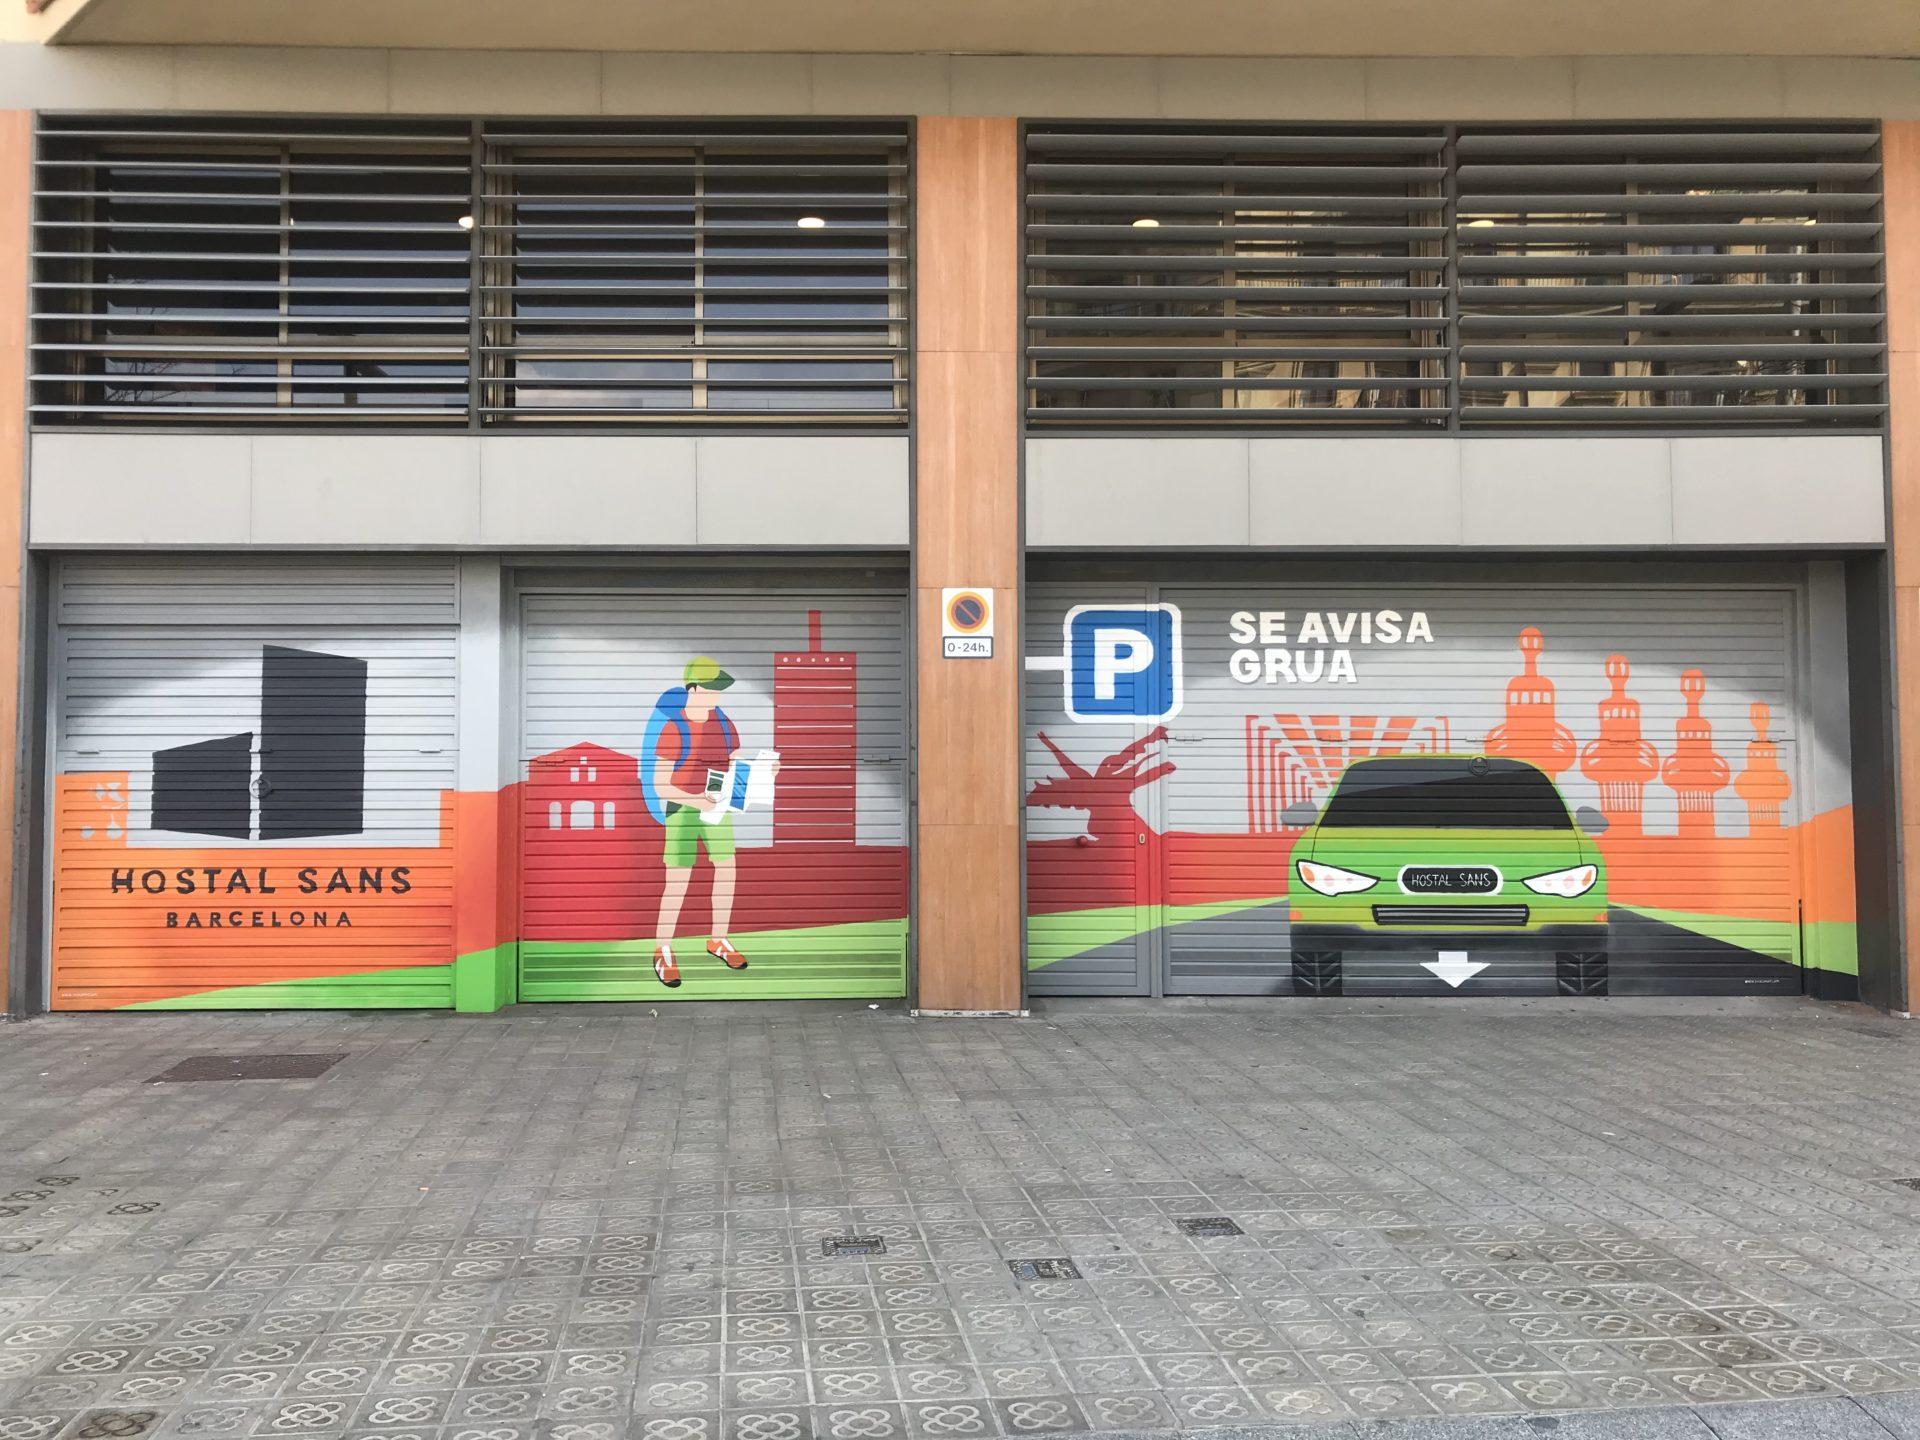 Graffiti Puertas de Parking